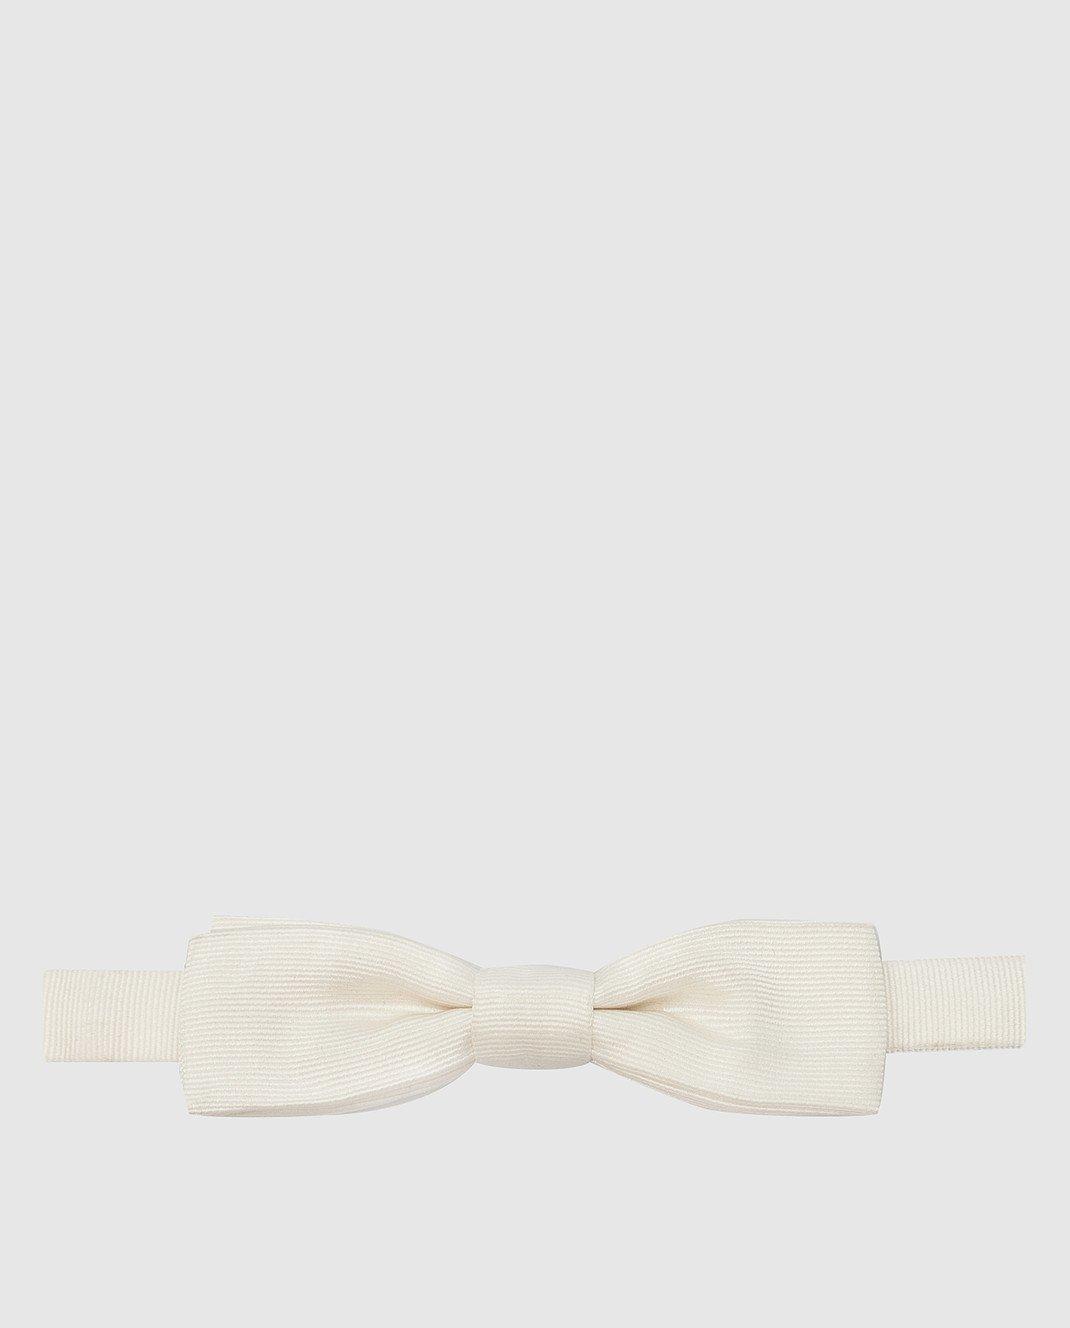 Dolce&Gabbana Светло-бежевая бабочка из шелка изображение 1